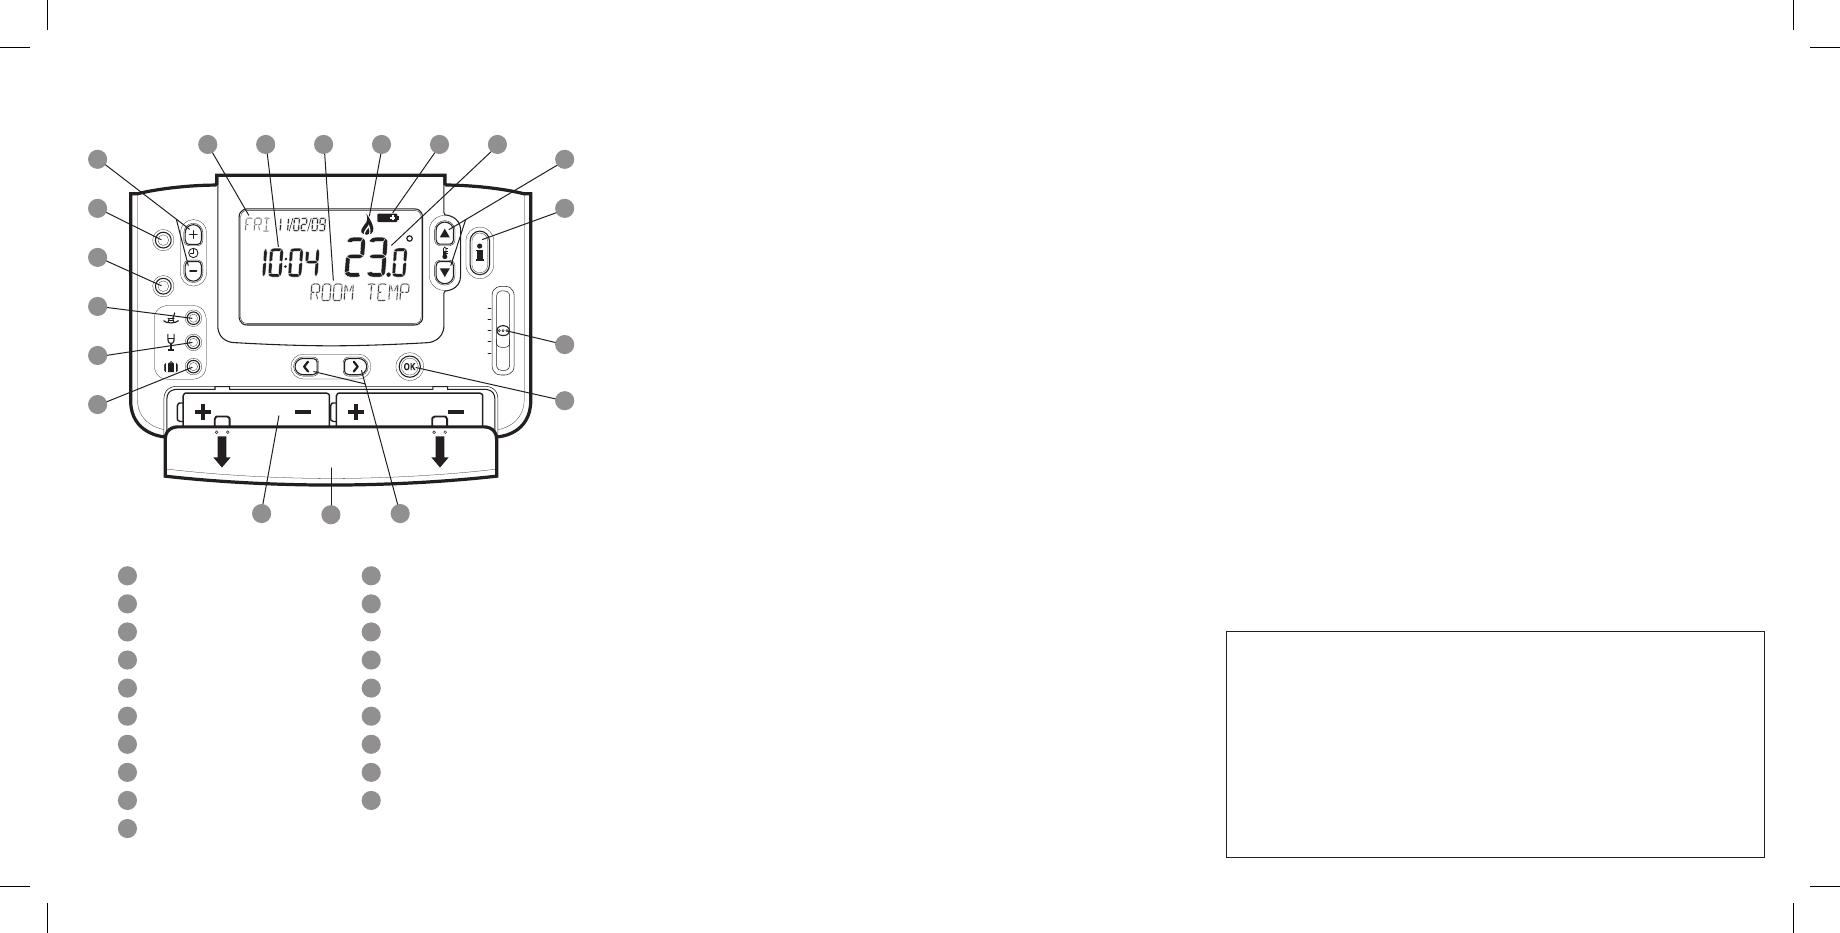 Handleiding Honeywell CM927 (pagina 2 van 18) (English) on honeywell schematic diagram, honeywell transformer wiring, honeywell wiring guide, honeywell relay wiring, honeywell installation manual, honeywell thermostat 5 wire, honeywell thermostat wiring, honeywell aquastat diagram, honeywell wiring wizard, honeywell parts, honeywell gas valves, honeywell heater system, honeywell power head, honeywell gas fireplace, honeywell thermostat blue wire, honeywell zone valve wiring, honeywell personal fans, honeywell thermostat diagram, honeywell v8043e wiring, honeywell wiring your home,